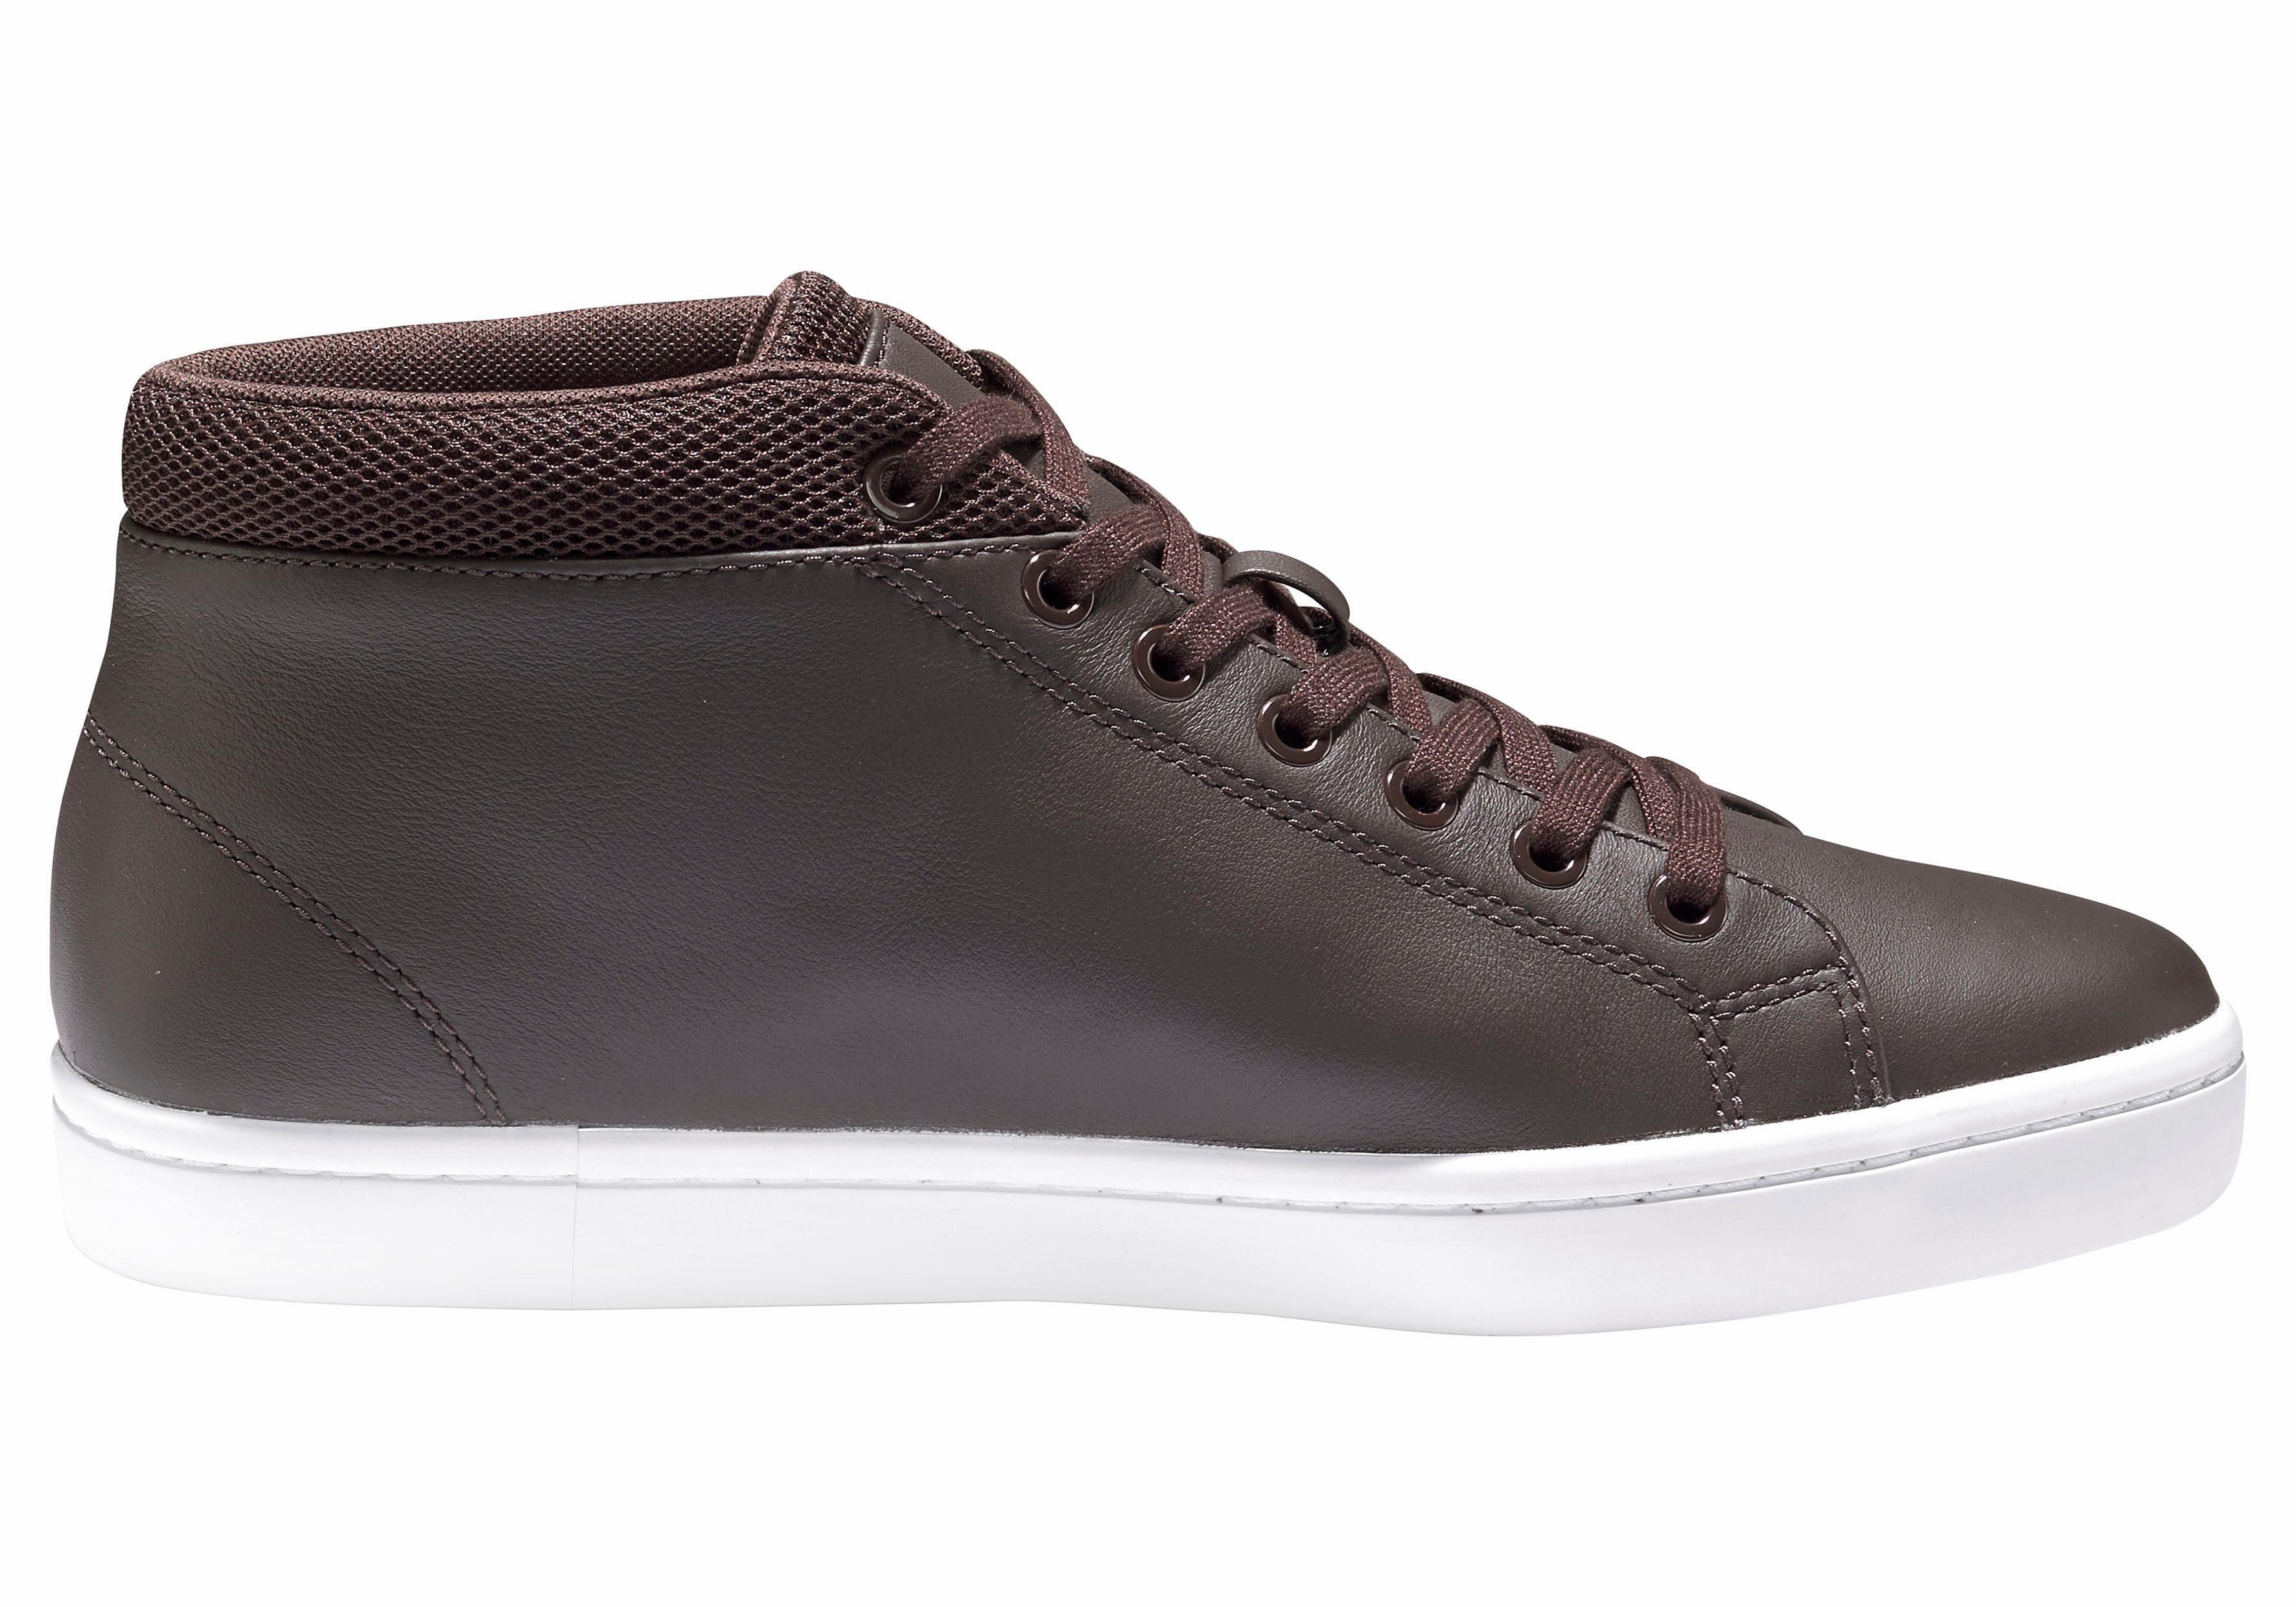 Chaussures De Sport Lacoste Haute 'straightset Sp Chukka' Dark BIqqr